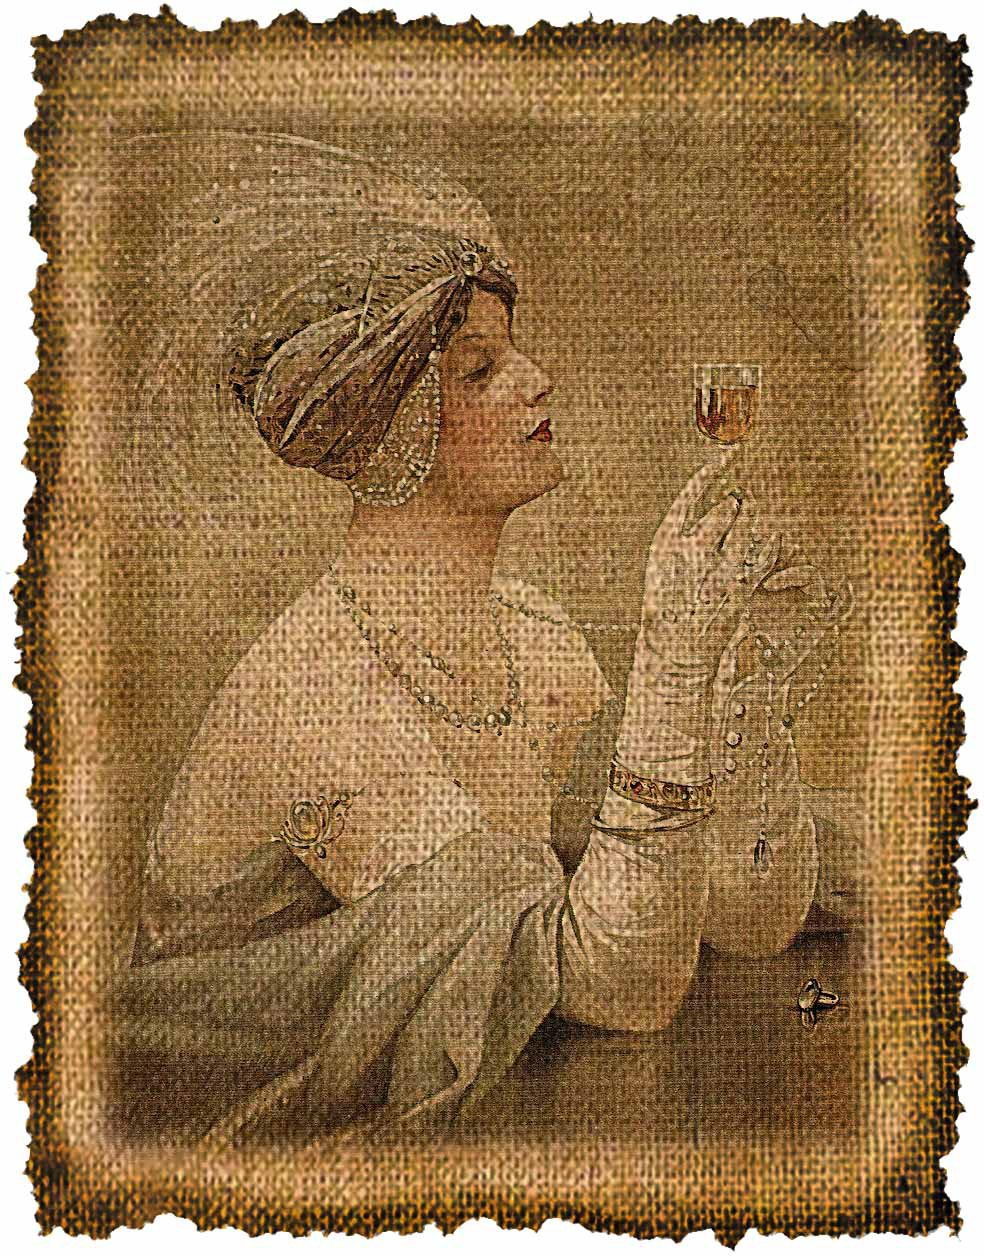 Vintage , Altered, Printable, Iron On, Ephemera, Digital Image No. 450